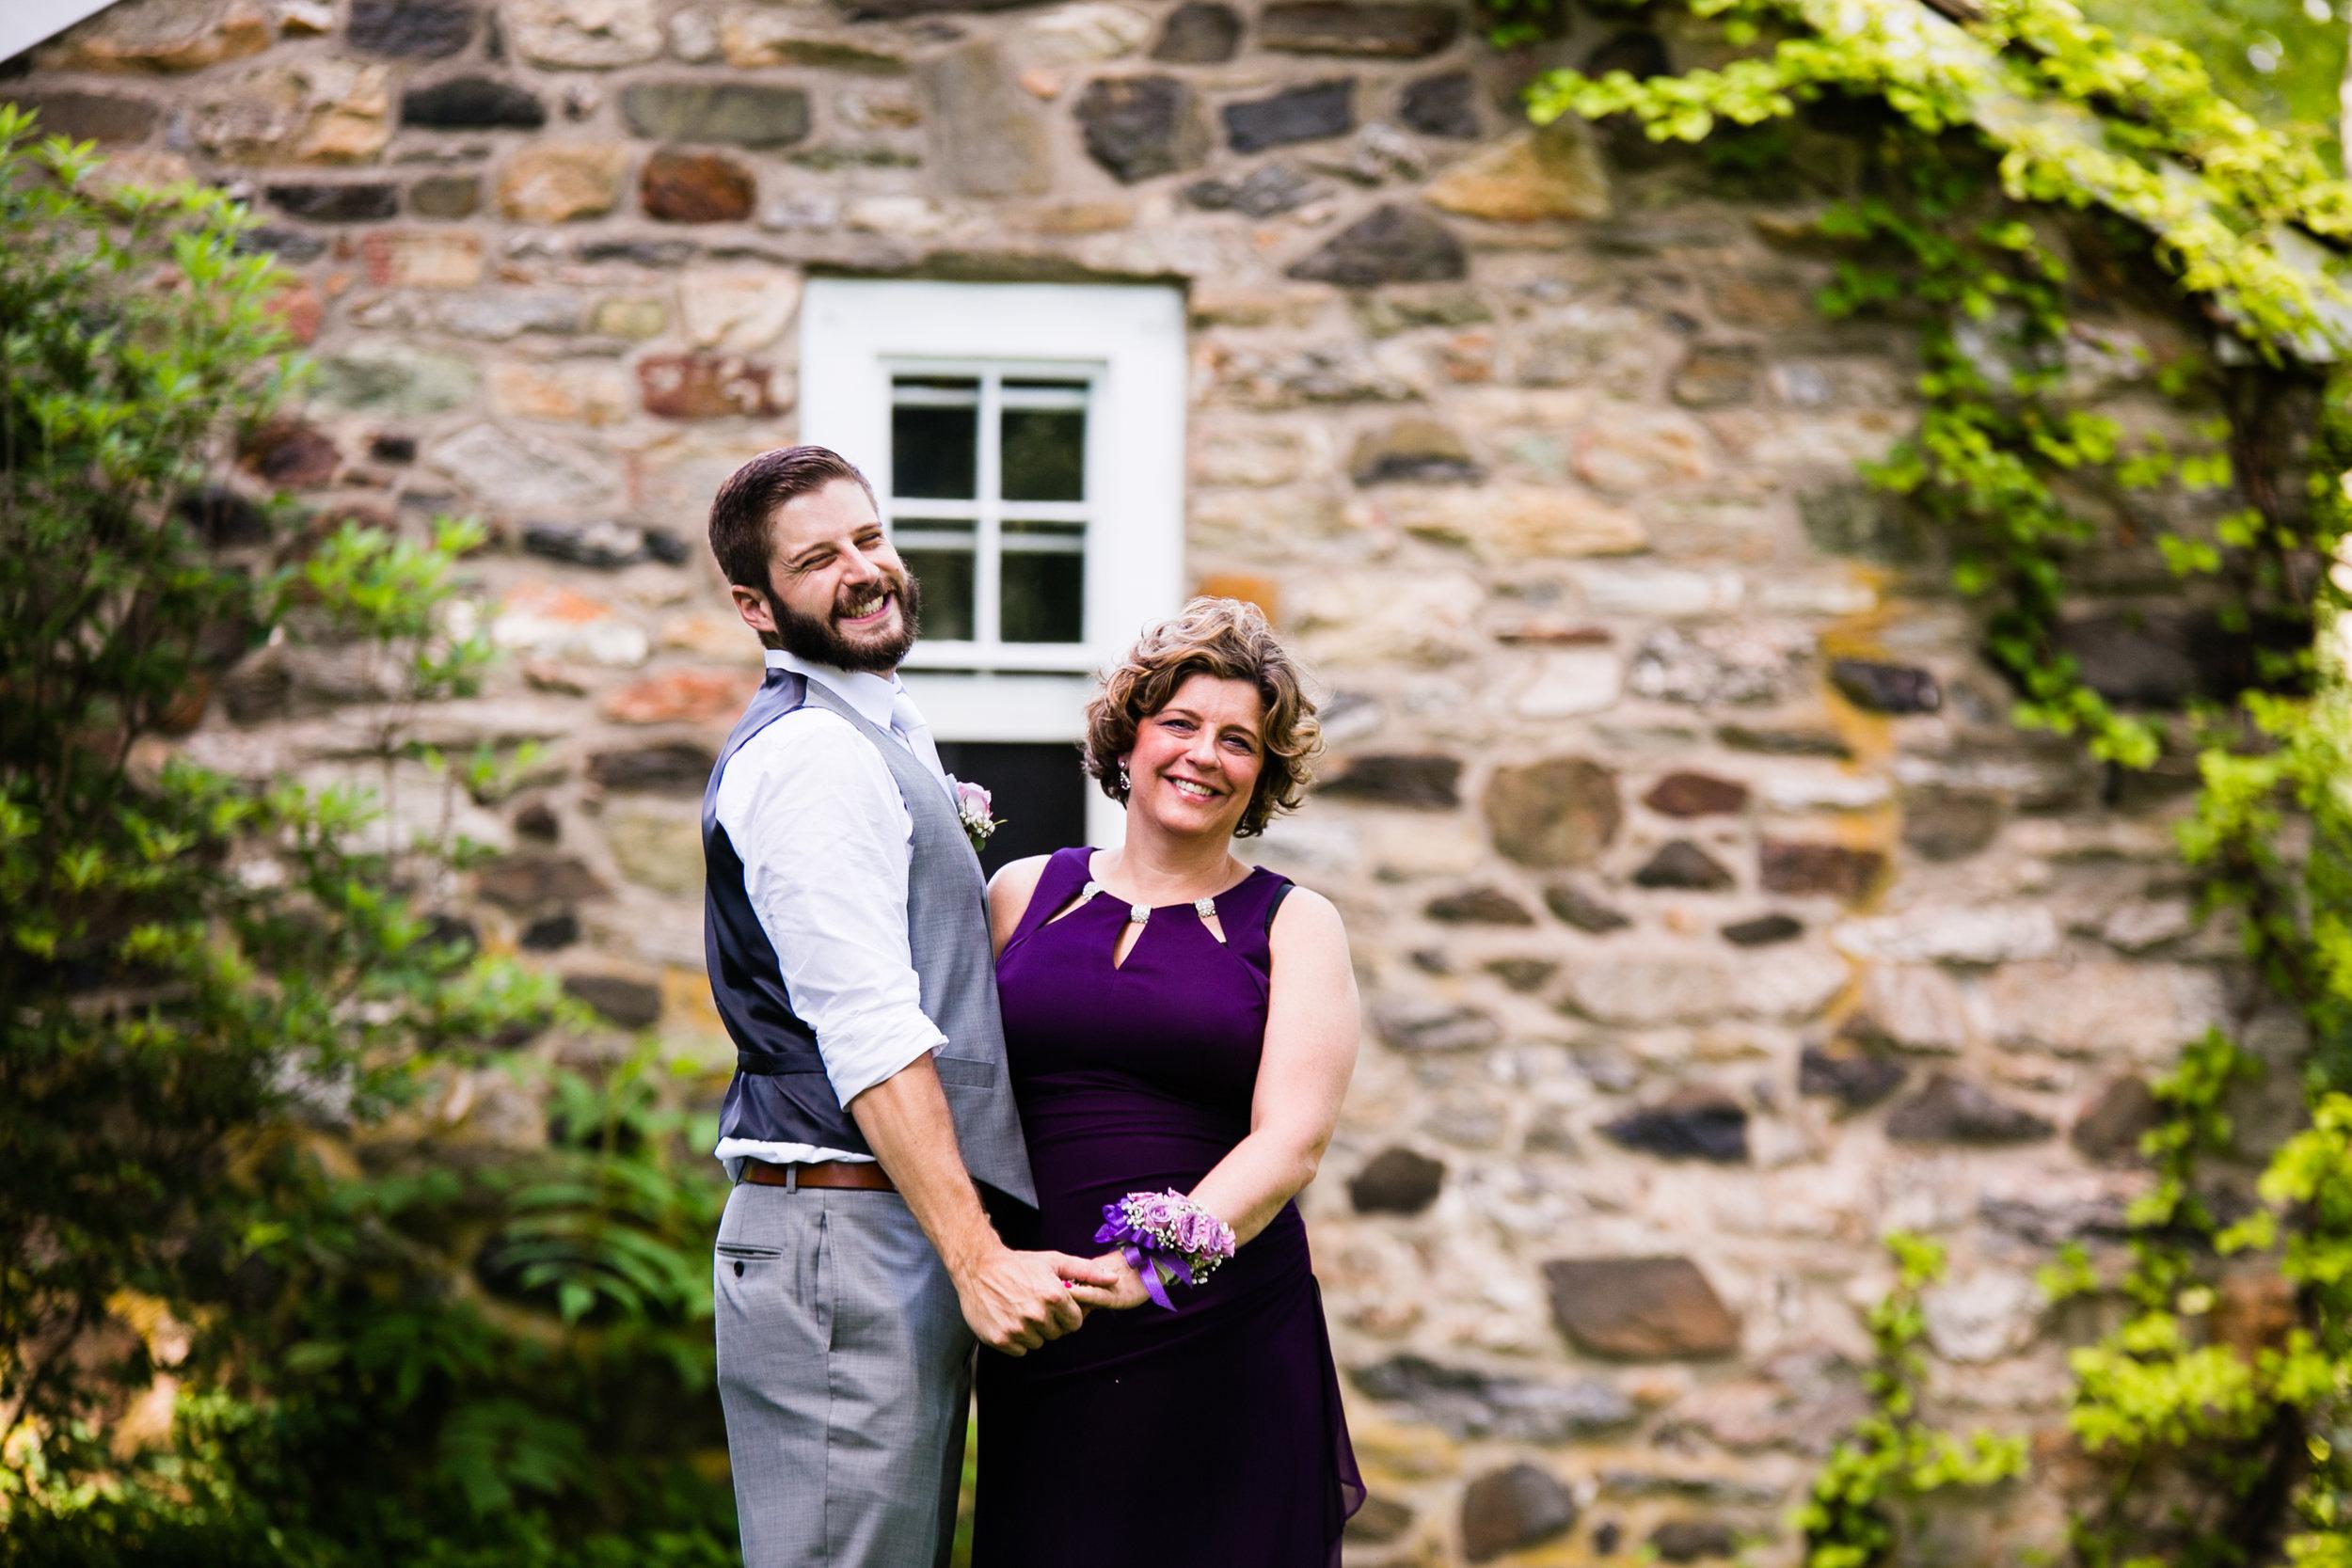 TYLER ARBORETUM WEDDING PHOTOGRAPHY LOVESTRUCK PICTURES-023.jpg